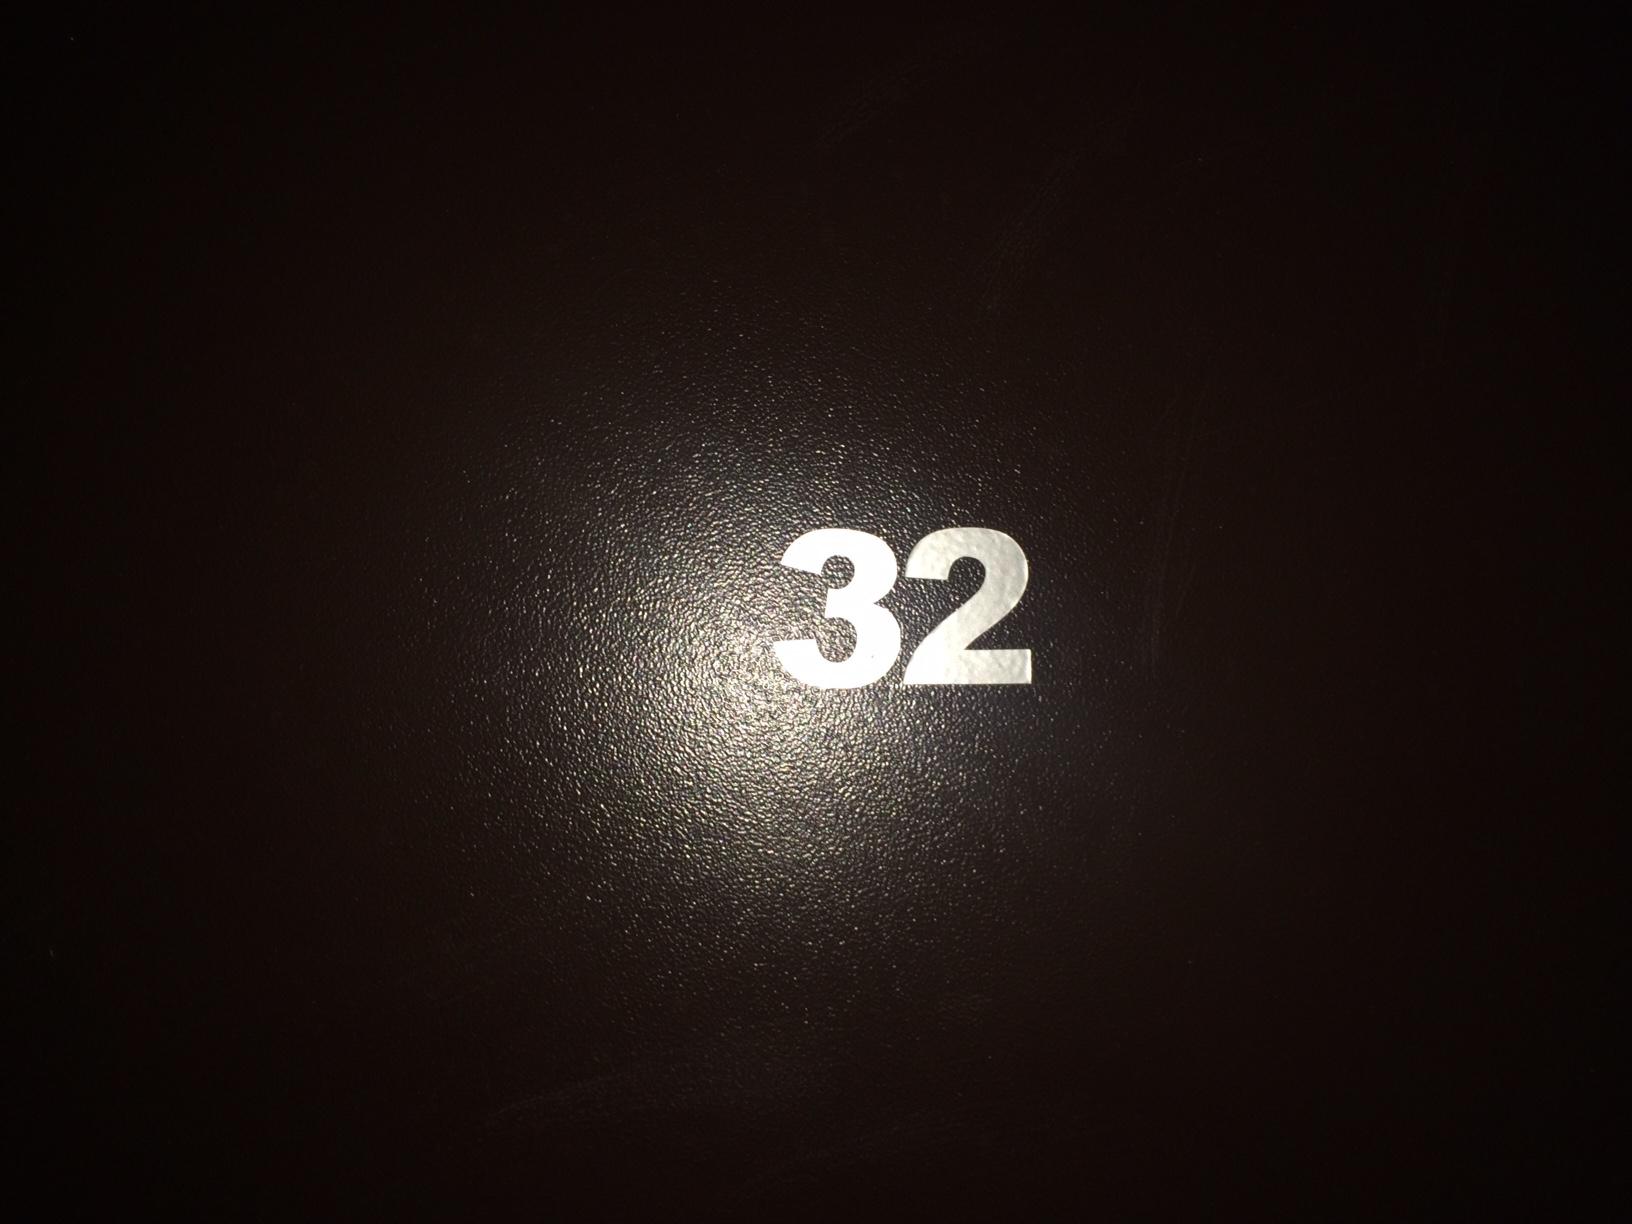 Boxa nr.32, Ansamblul Izvorul Dorului, Sinaia